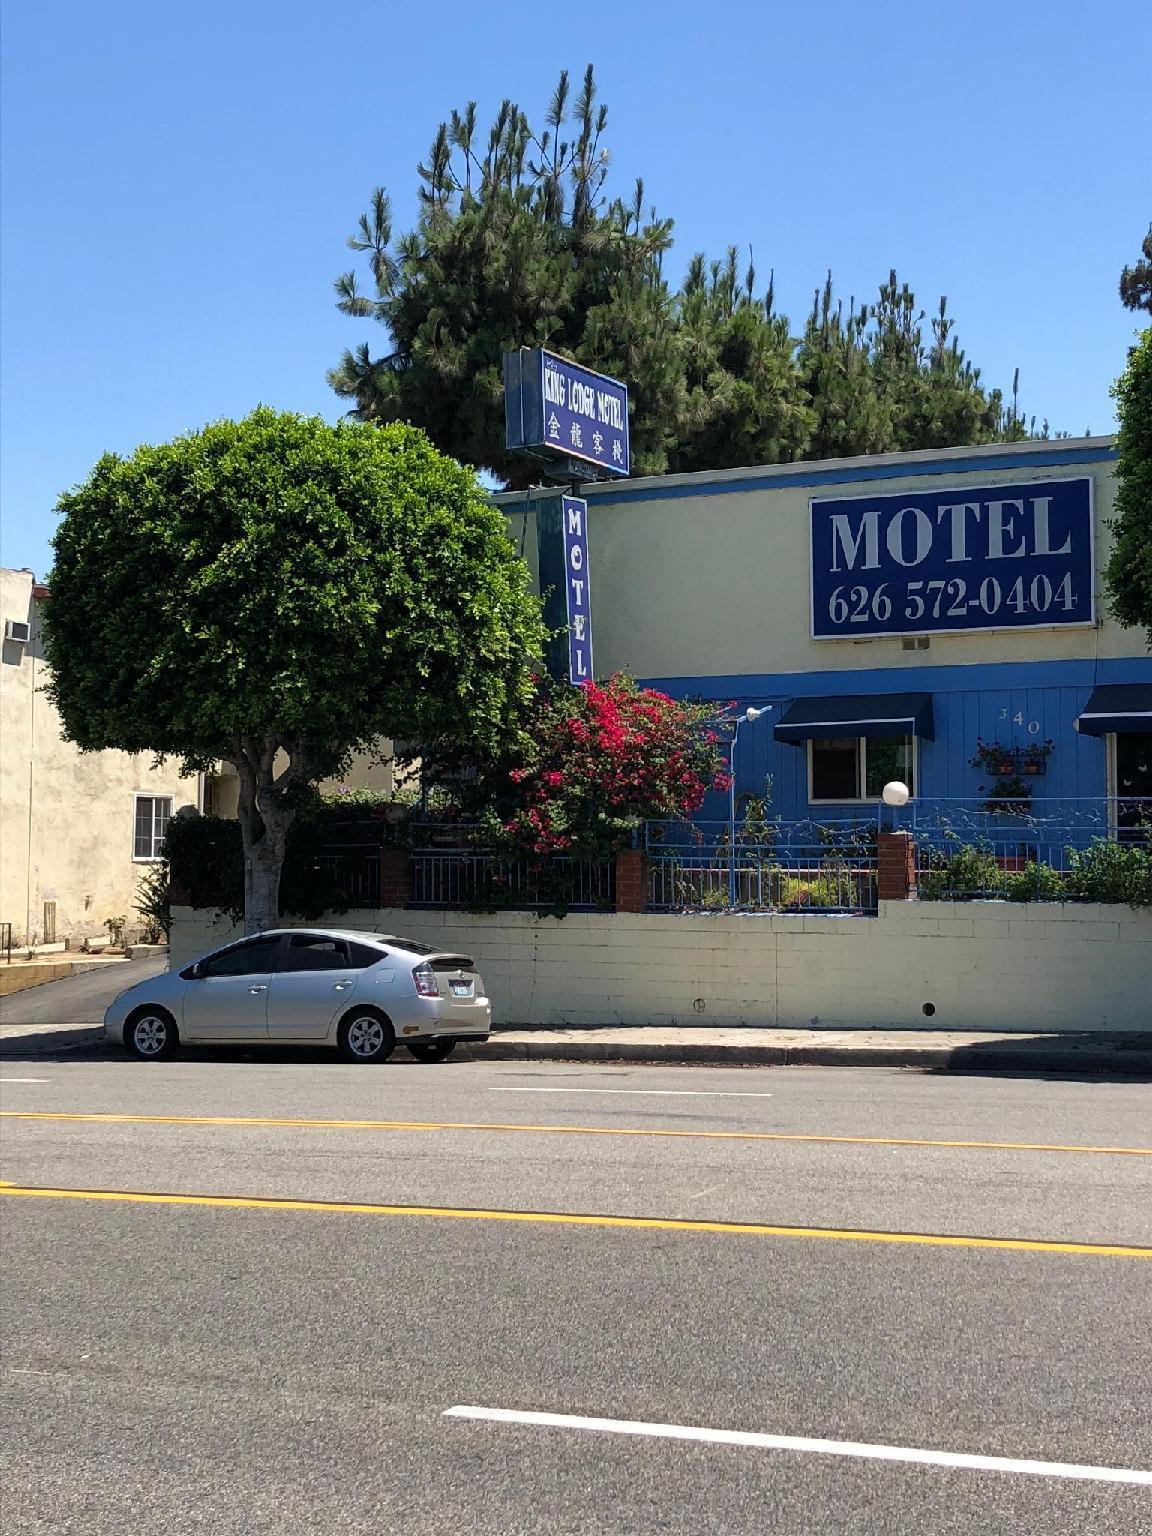 King Lodge Motel